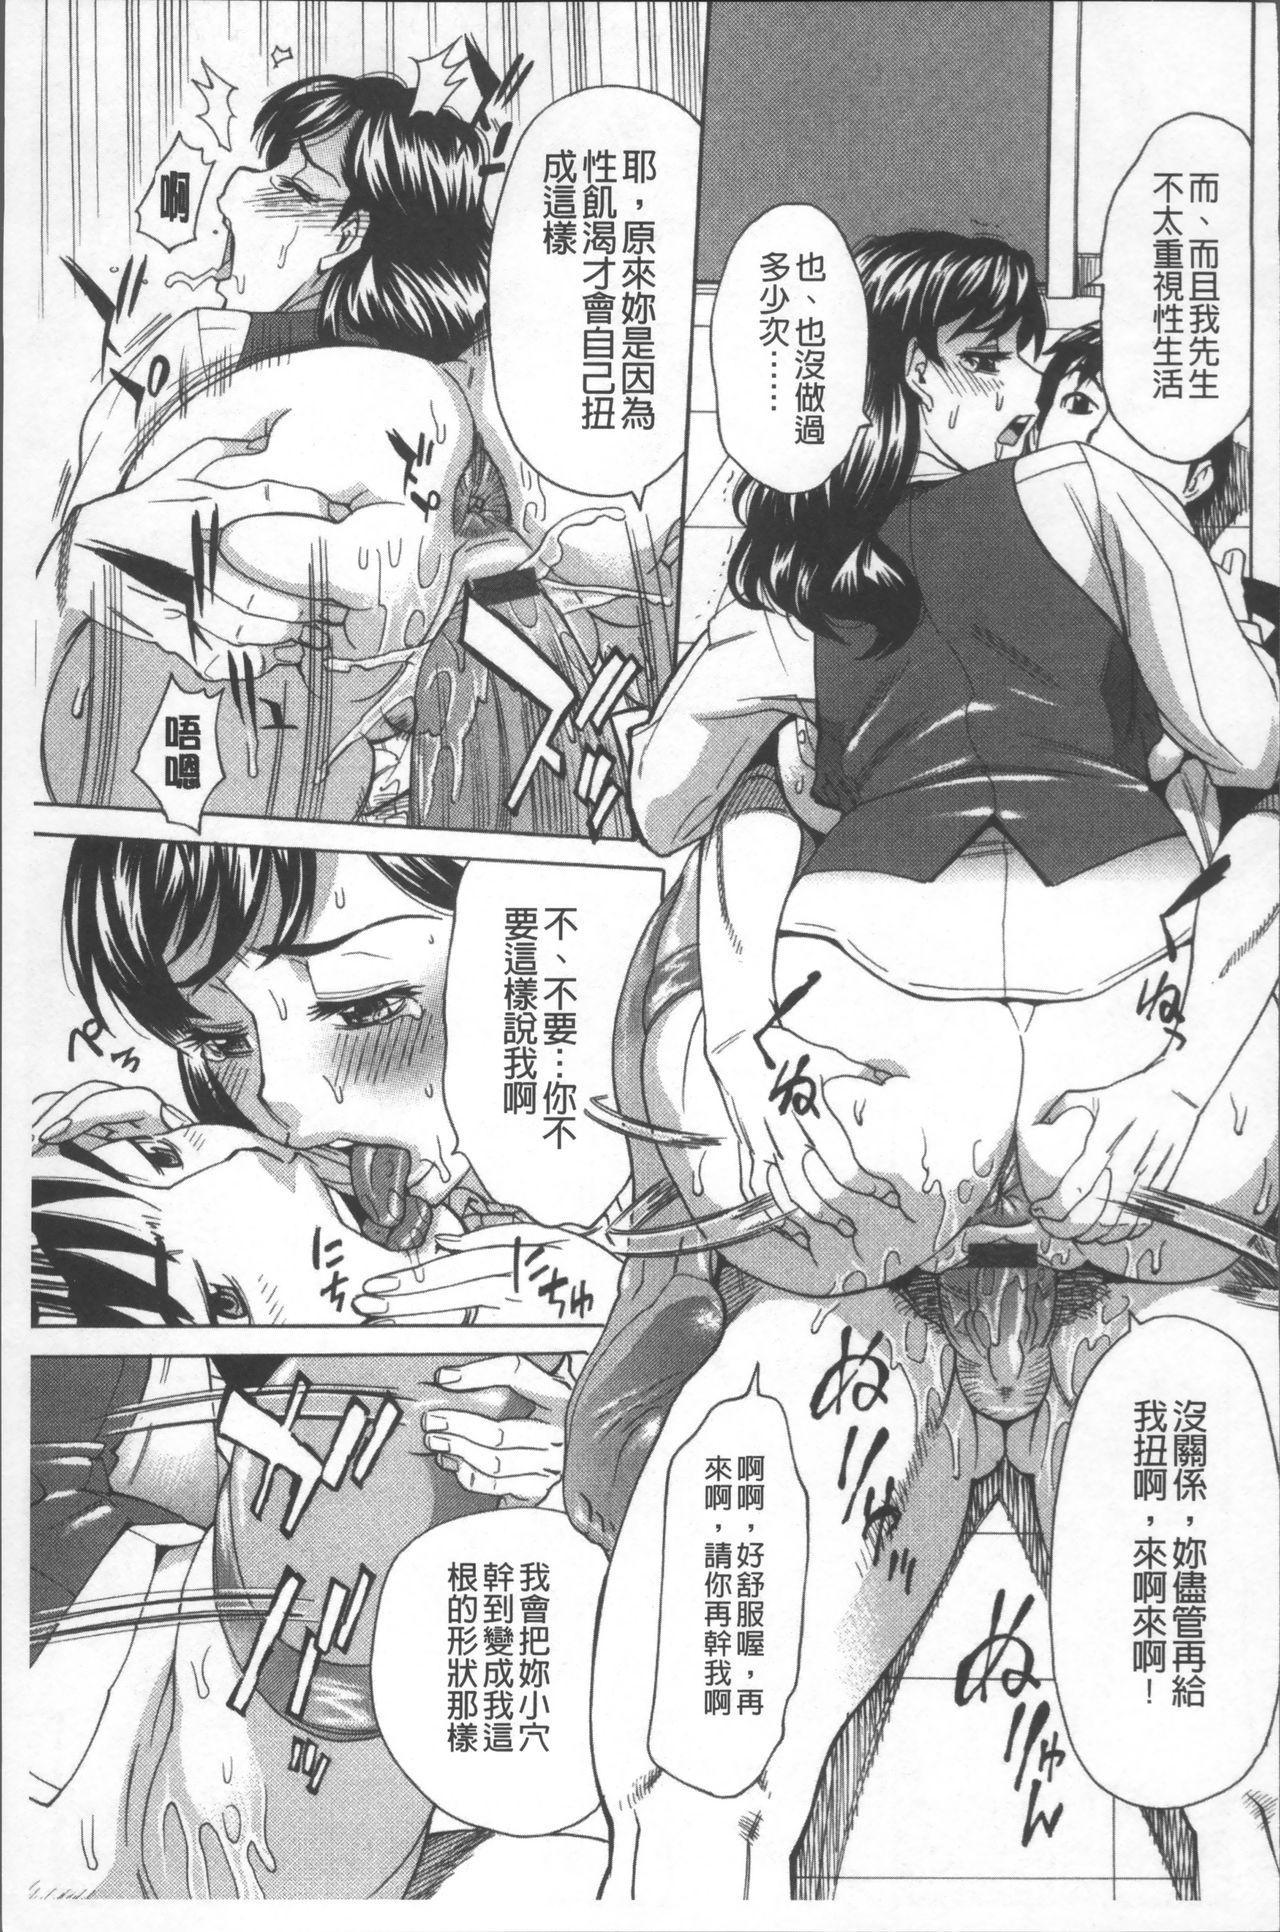 Hitozuma Kanshasai - SUPER EROTIC WIFE'S FESTIVAL 174